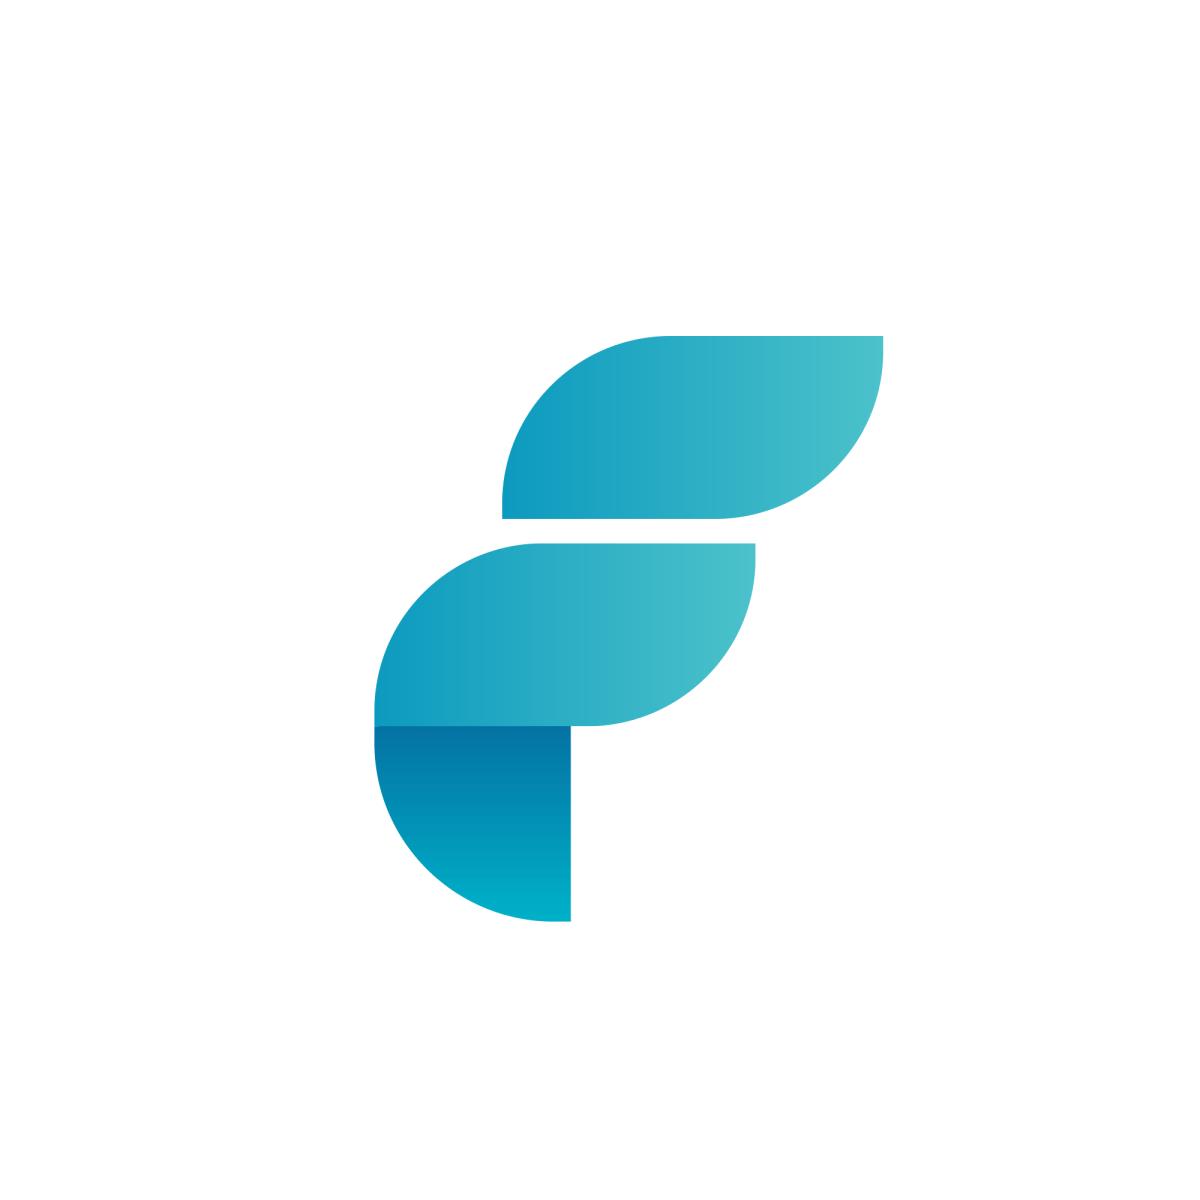 Fund Forum Poland Letter F Logo Design Typography Letter Logo